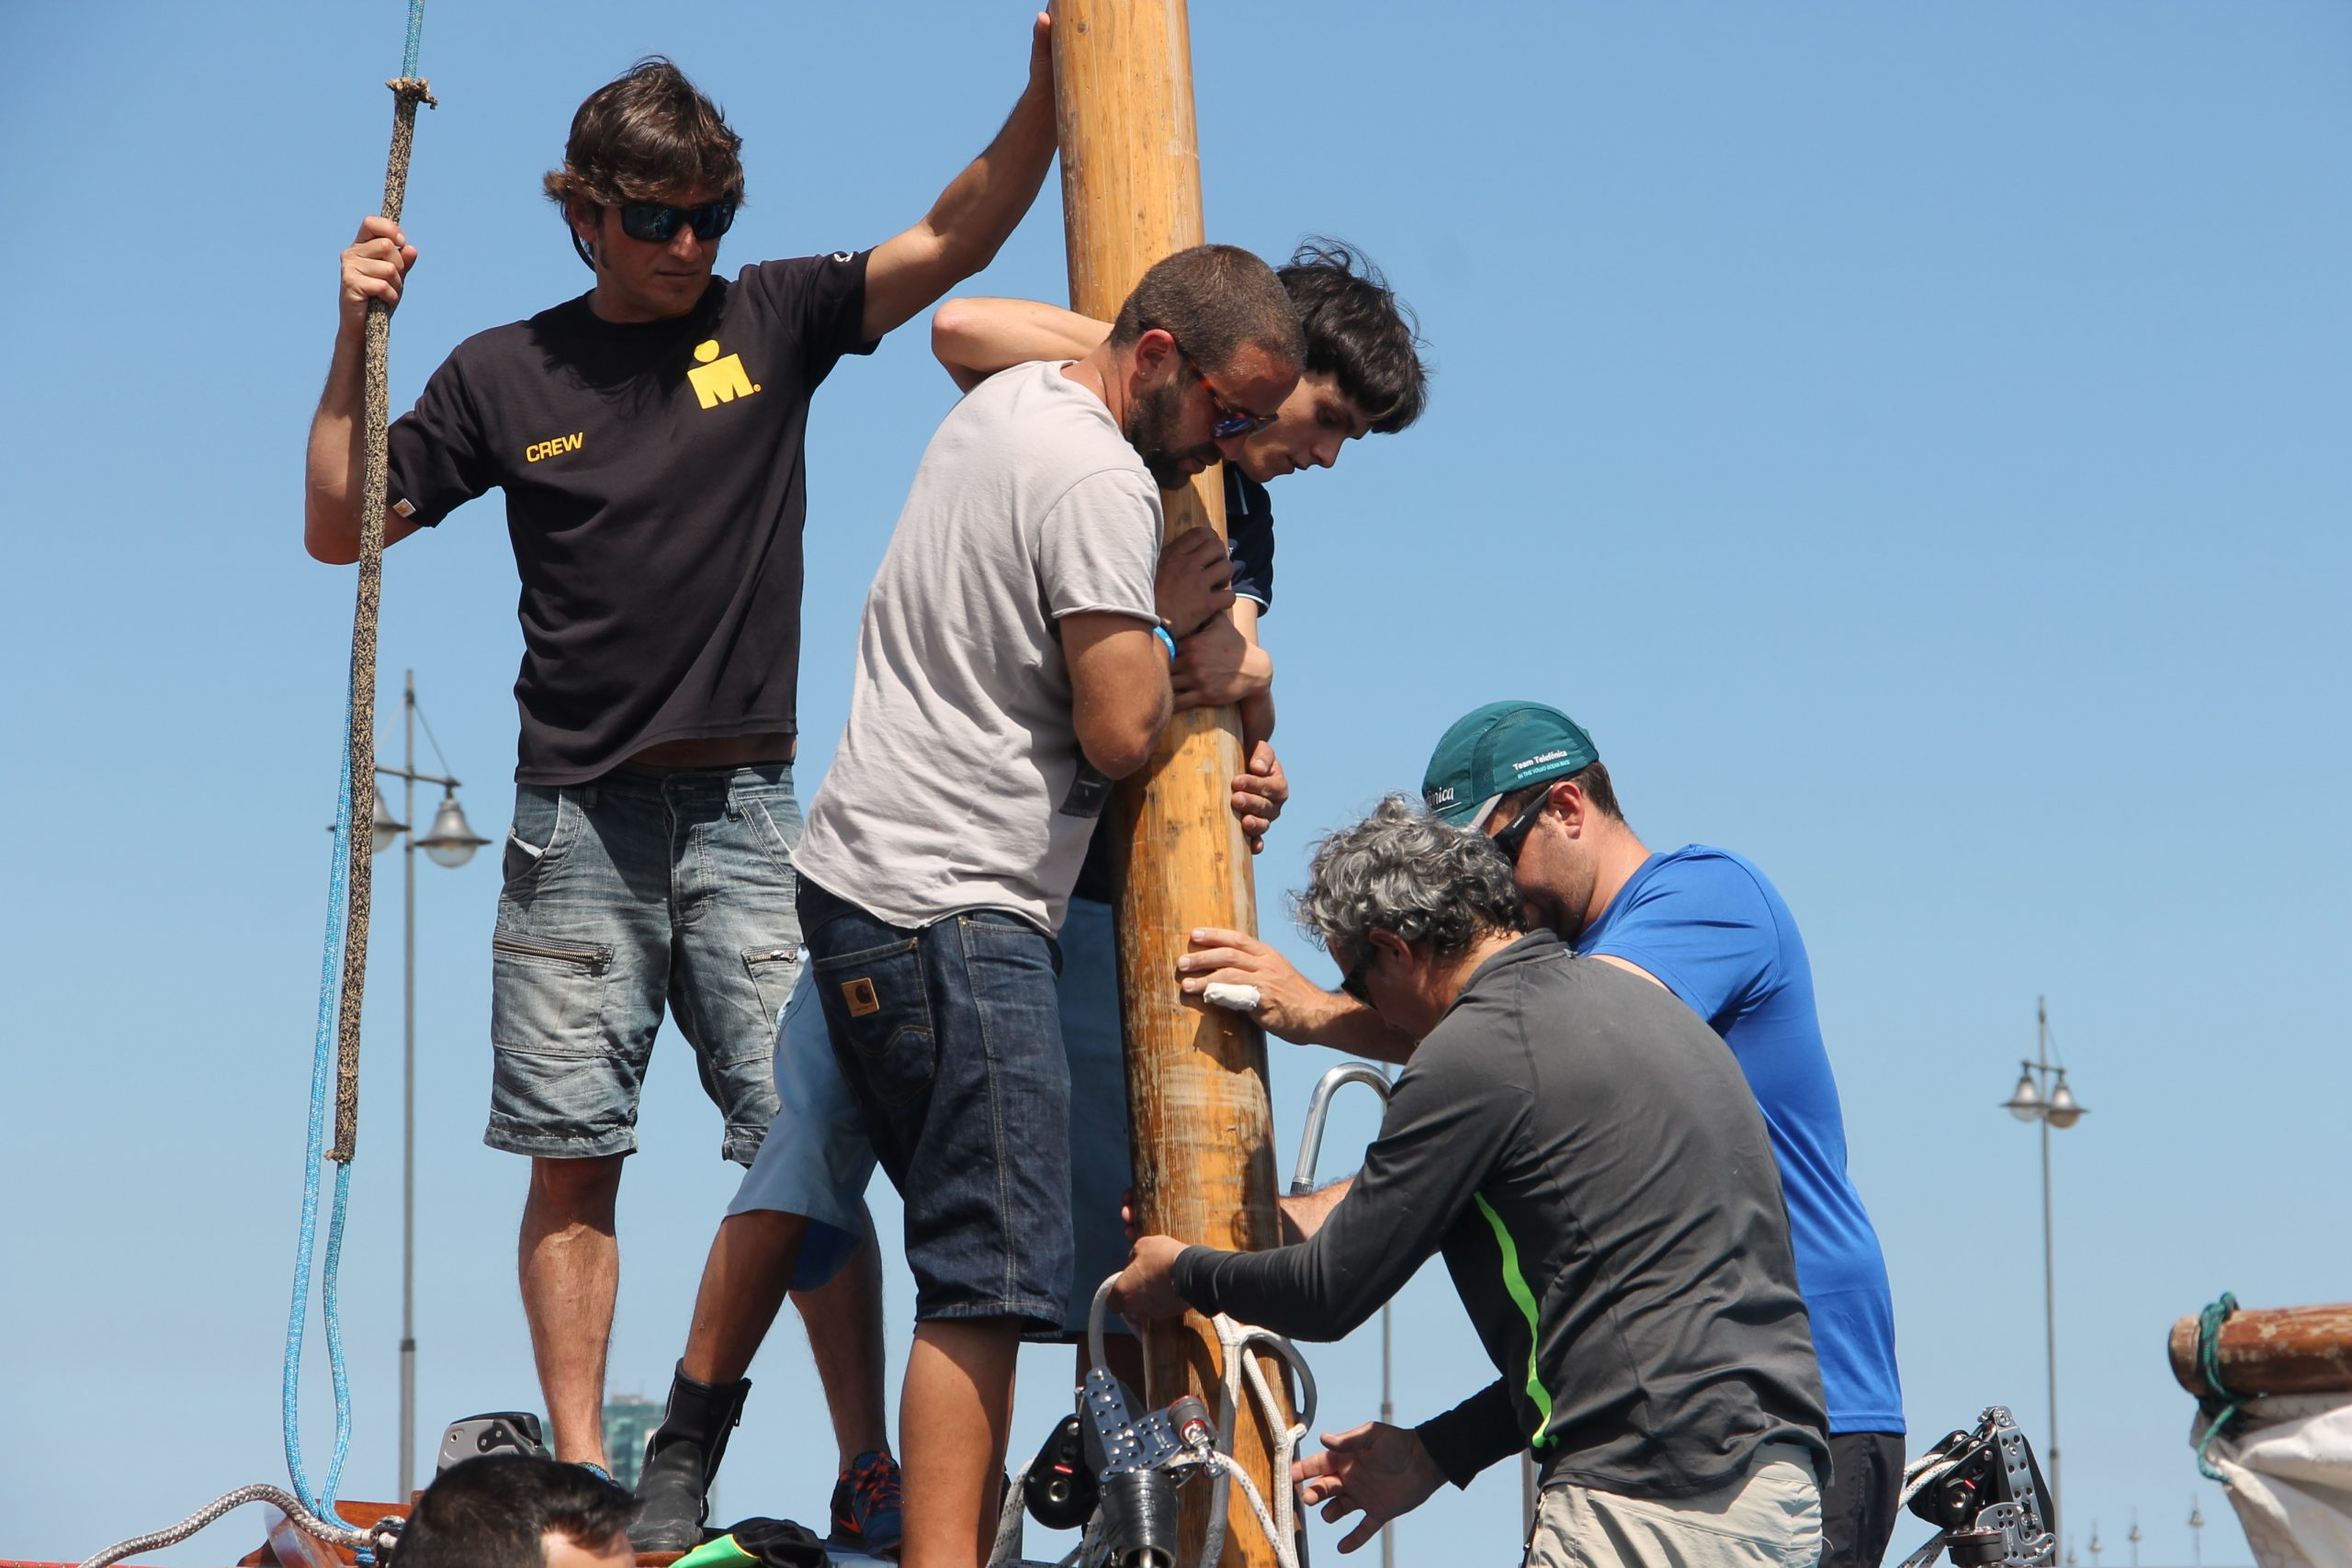 Doble jornada de la Liga Insular barquillos de 8,55 metros para el fin de semana